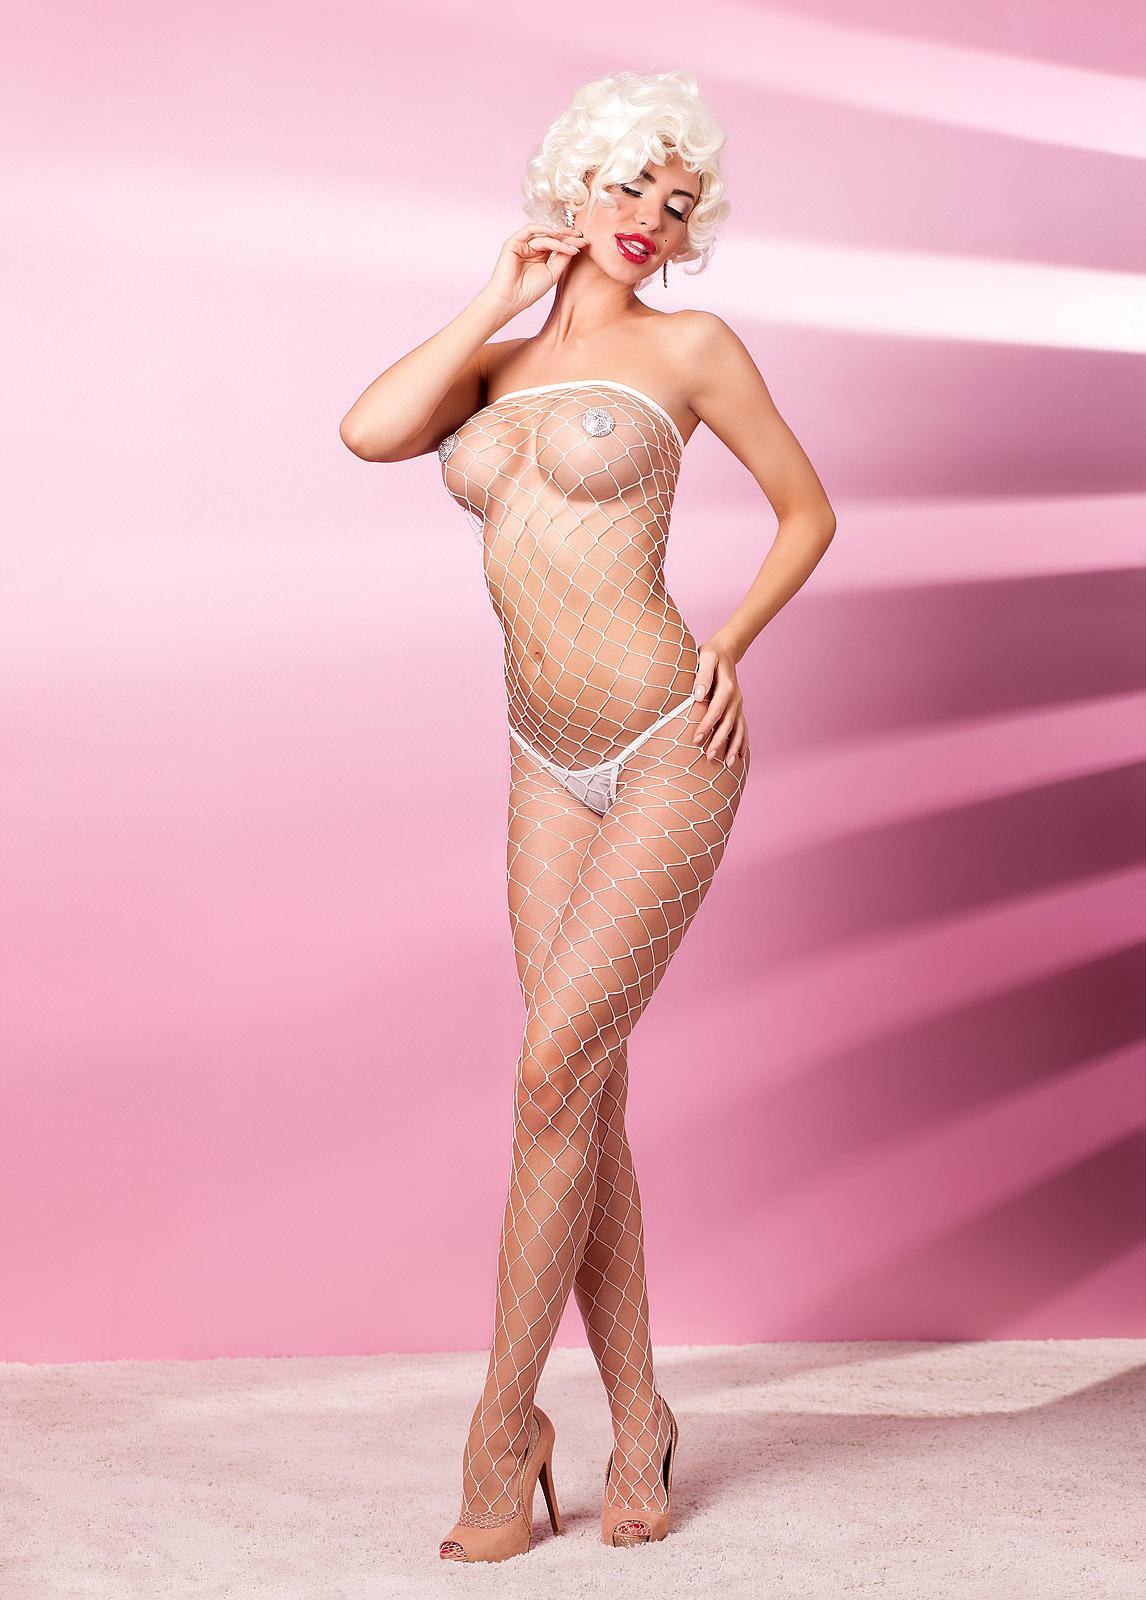 hot women - Monika Pietrasinska